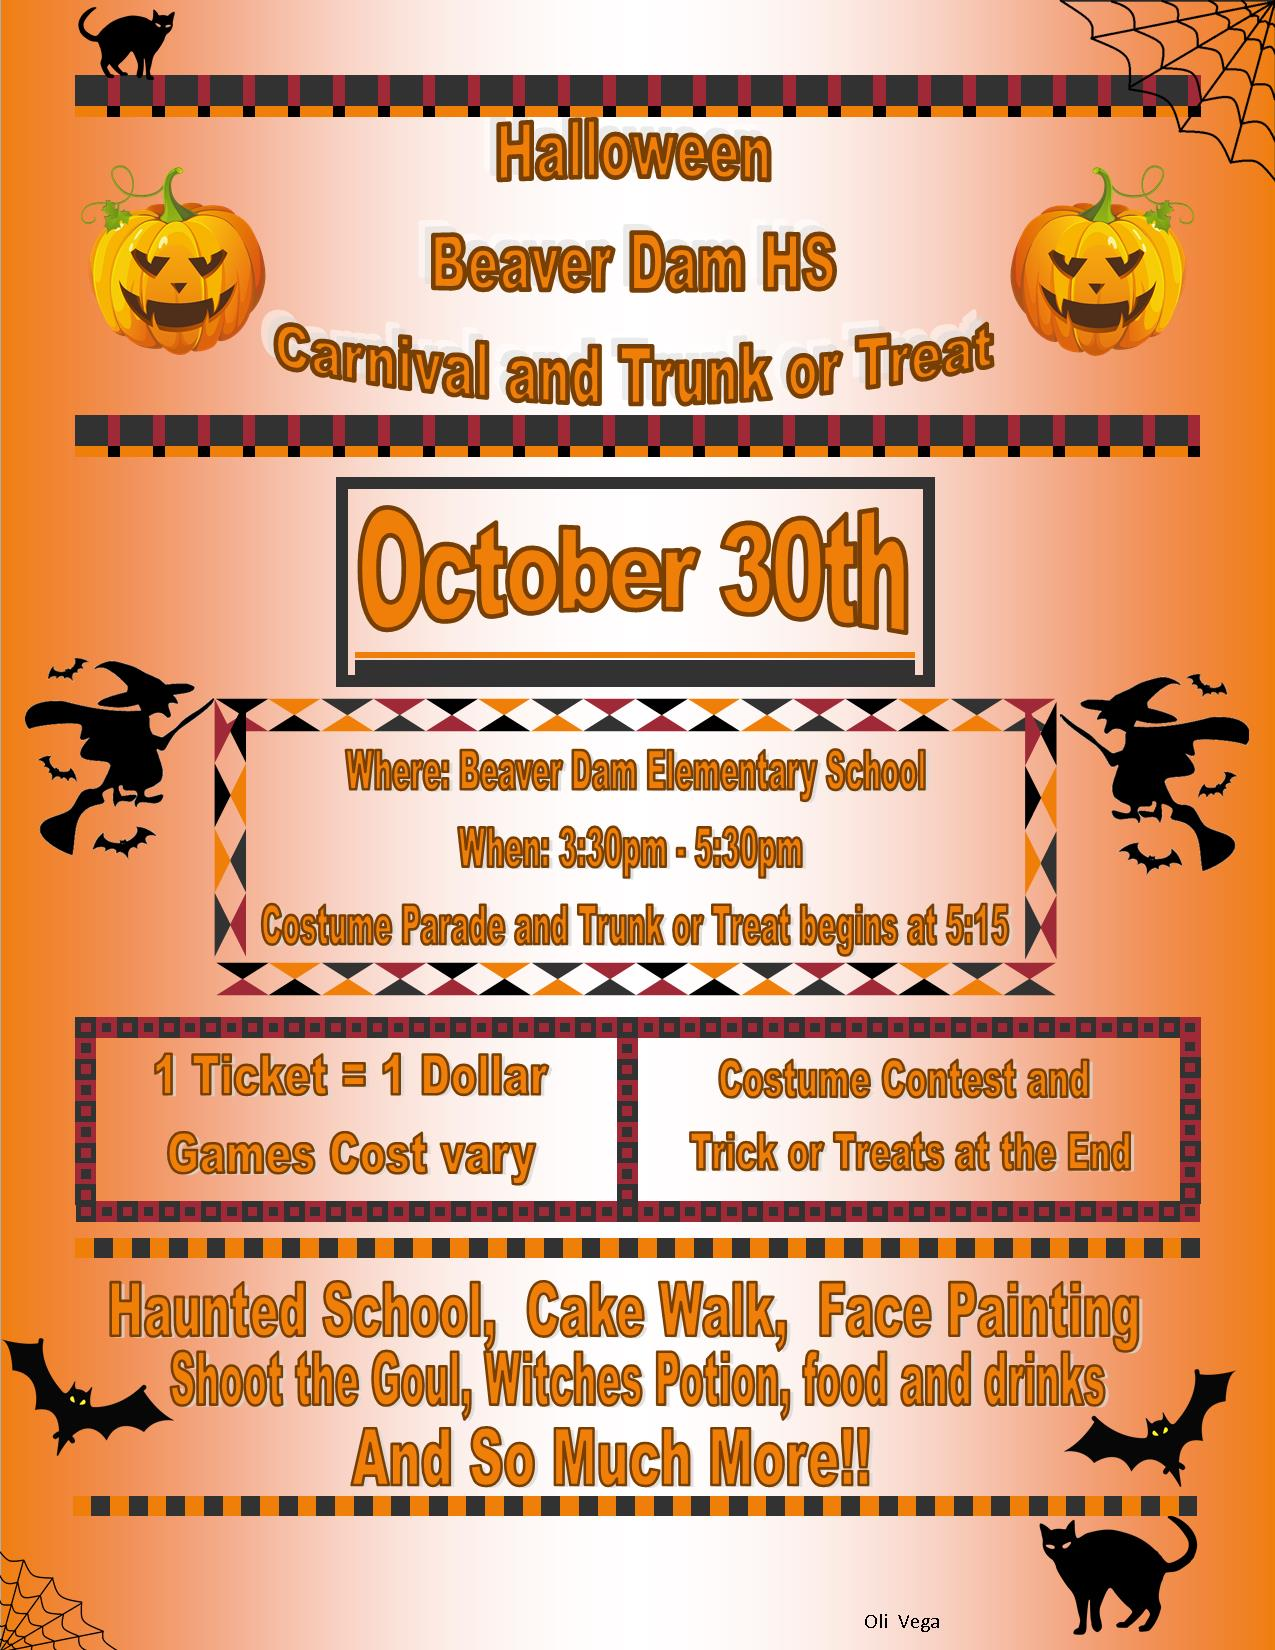 Beaver Dam Second Annual Halloween Carnival